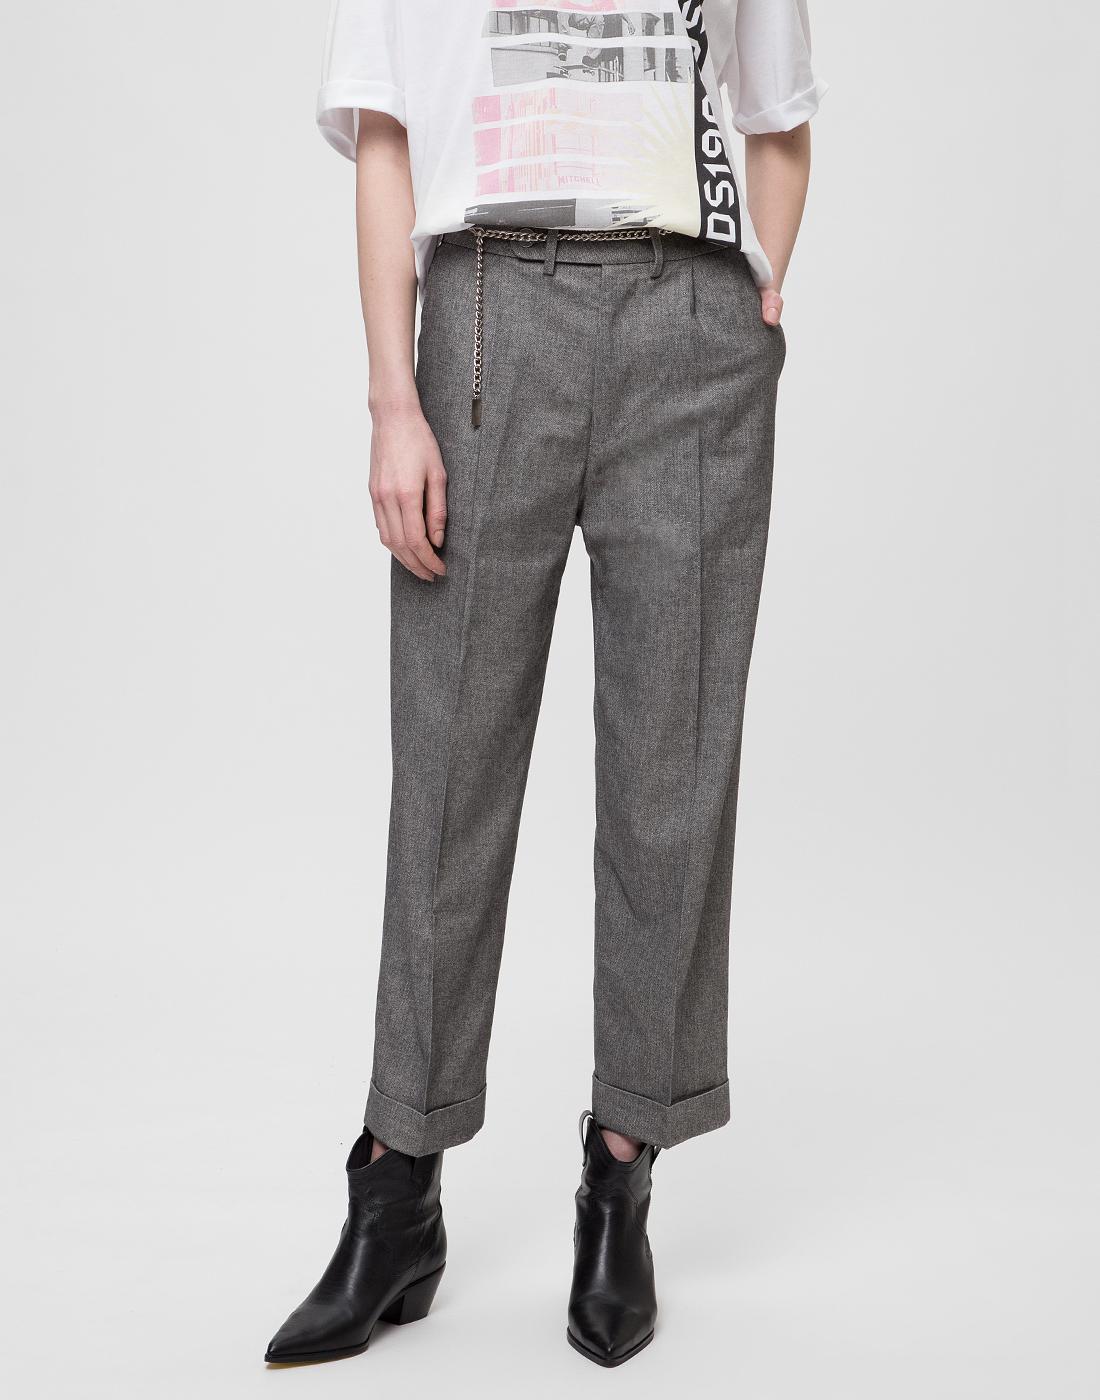 Женские серые брюки Tramarossa SO168-2